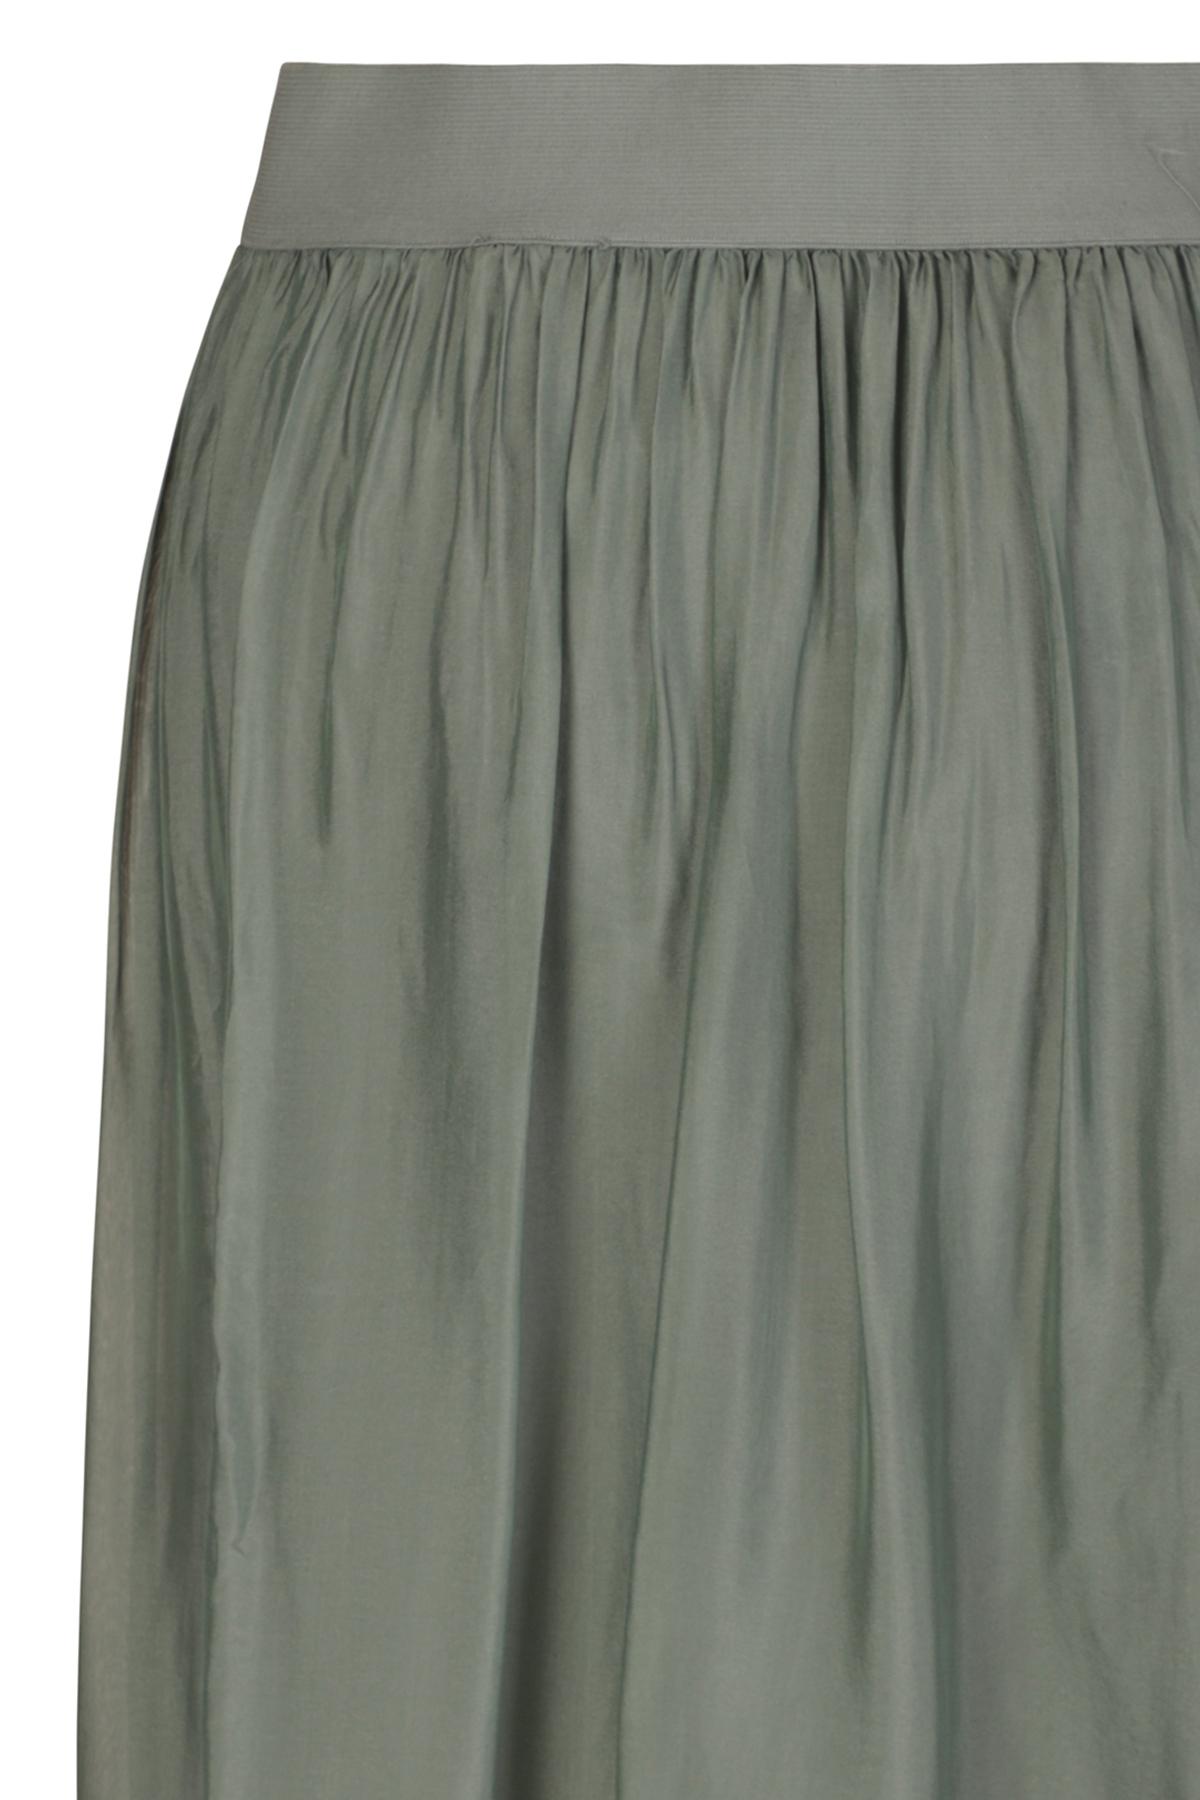 Geisha Rok Groen 06051-70